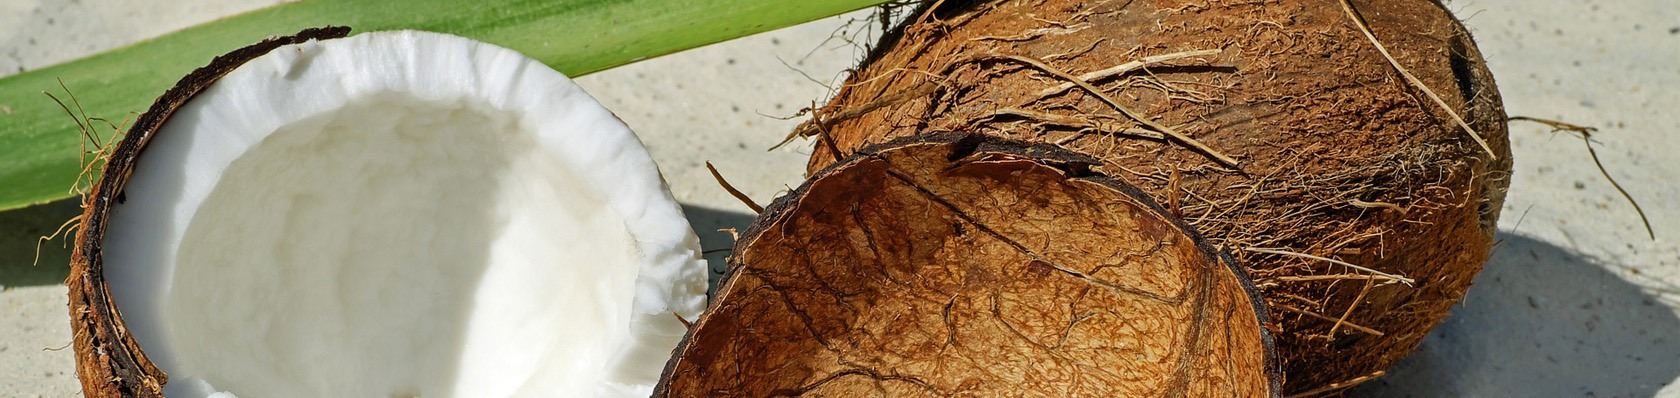 Kokosöle im Test auf ExpertenTesten.de